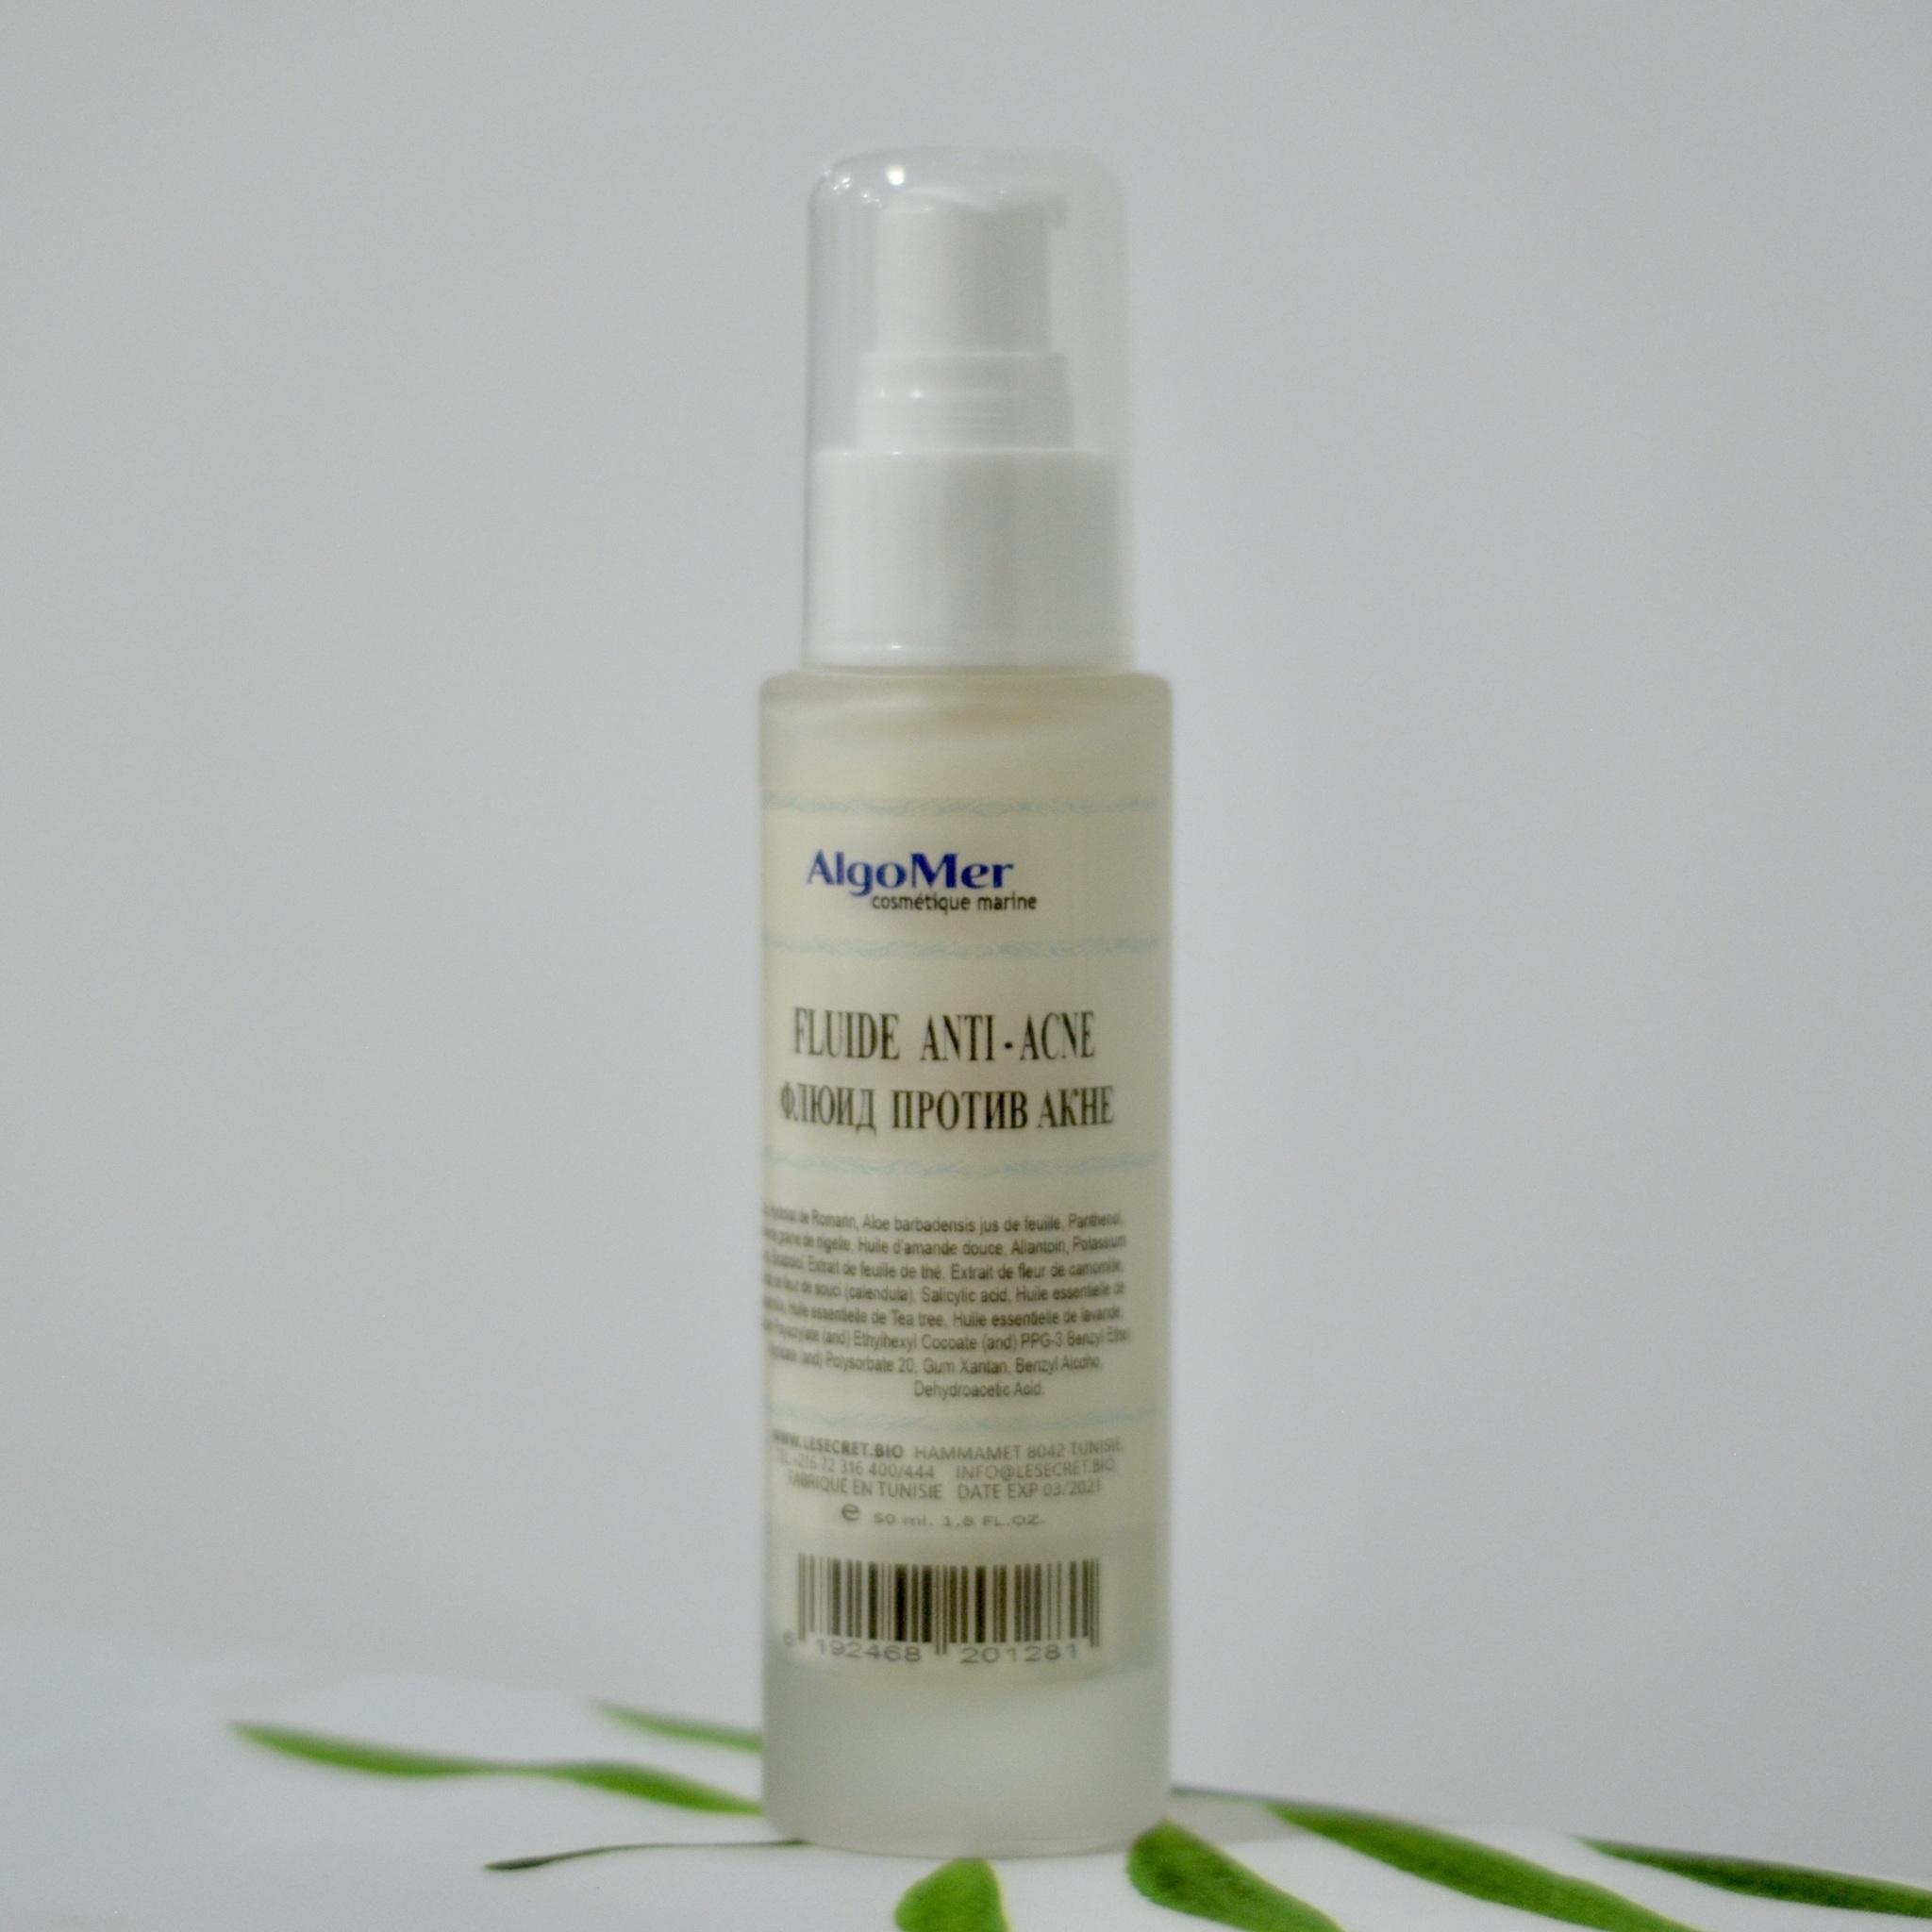 Algomer Fluide Anti-Acne